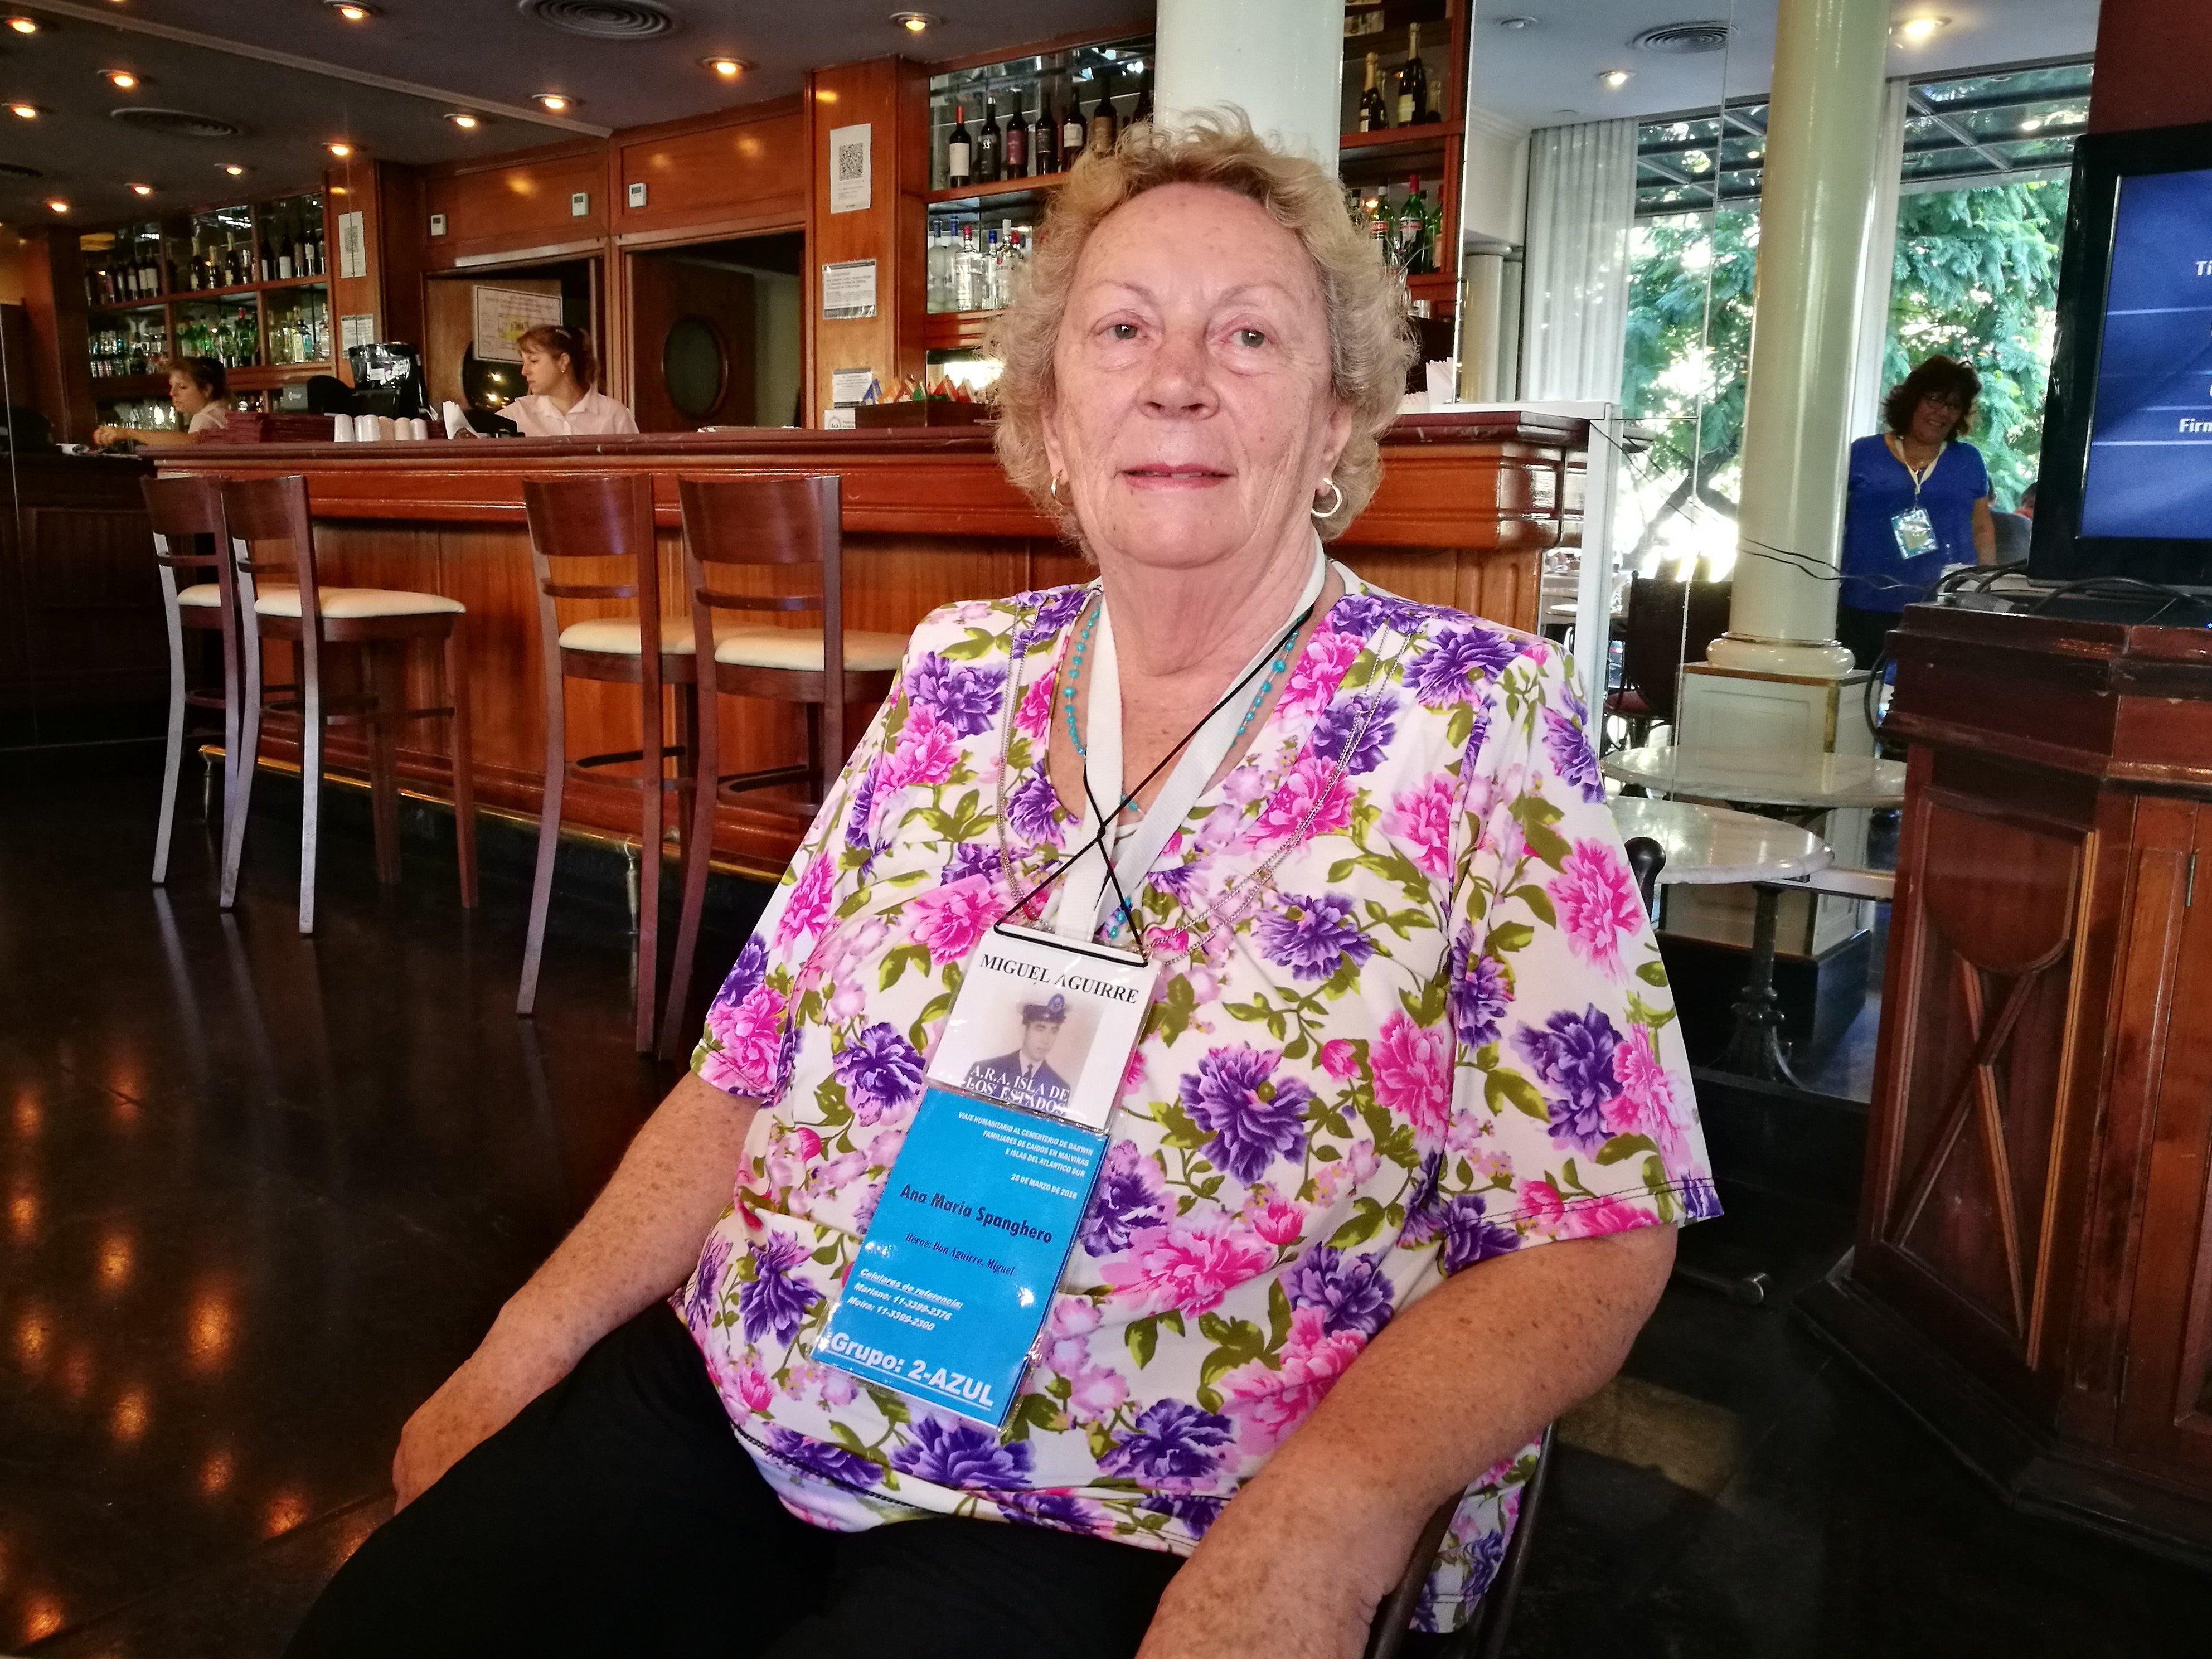 Ana María Spanghero, widow of Miguel Aguirre killed in combat on the Malvinas Islands.